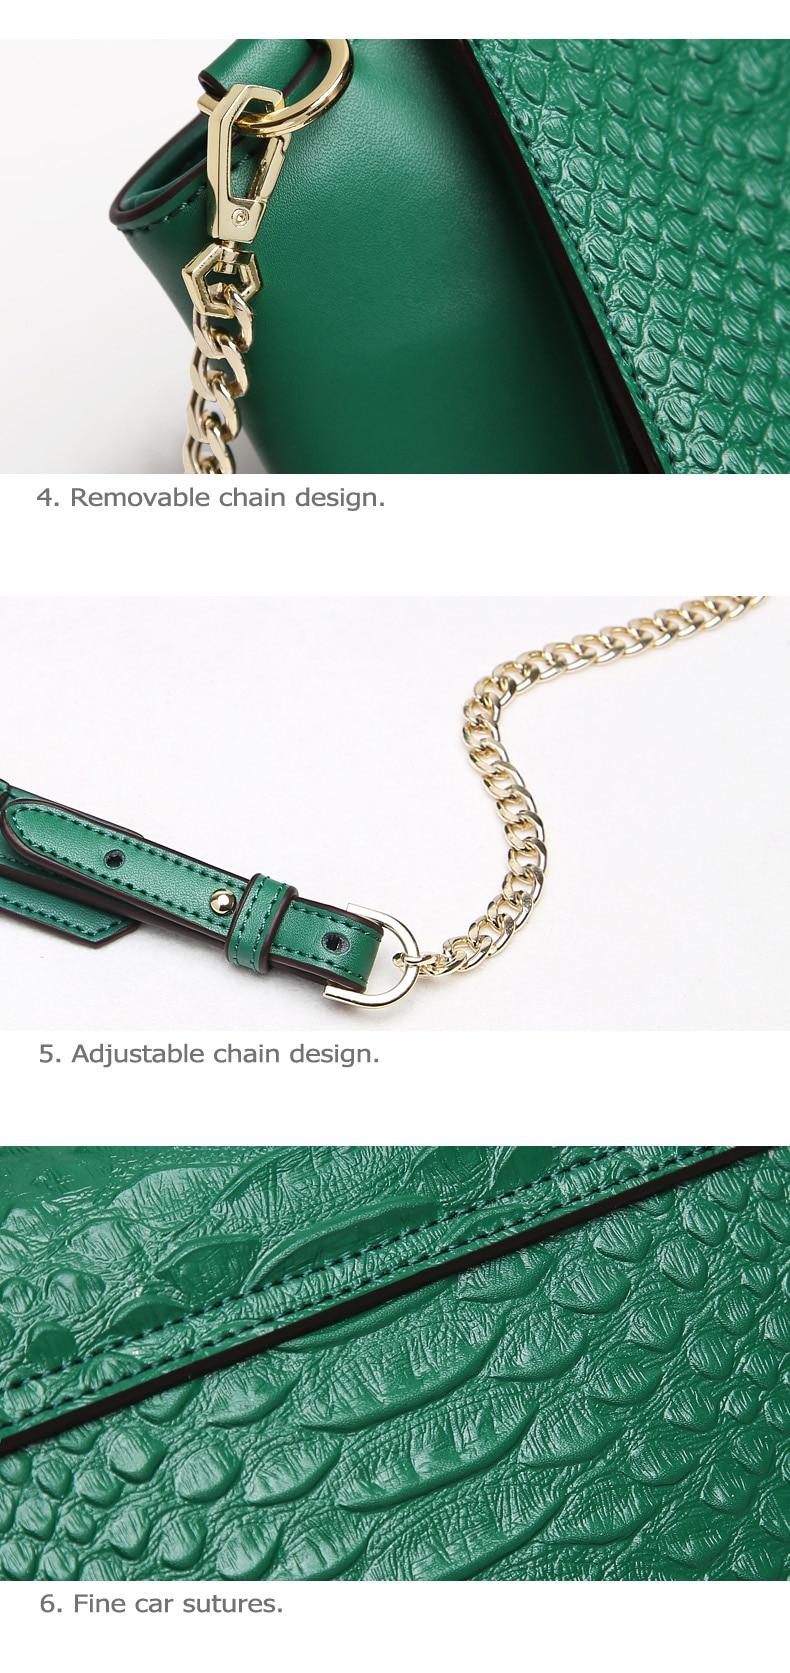 crossbody bolsa de couro rachado crocodilo textura